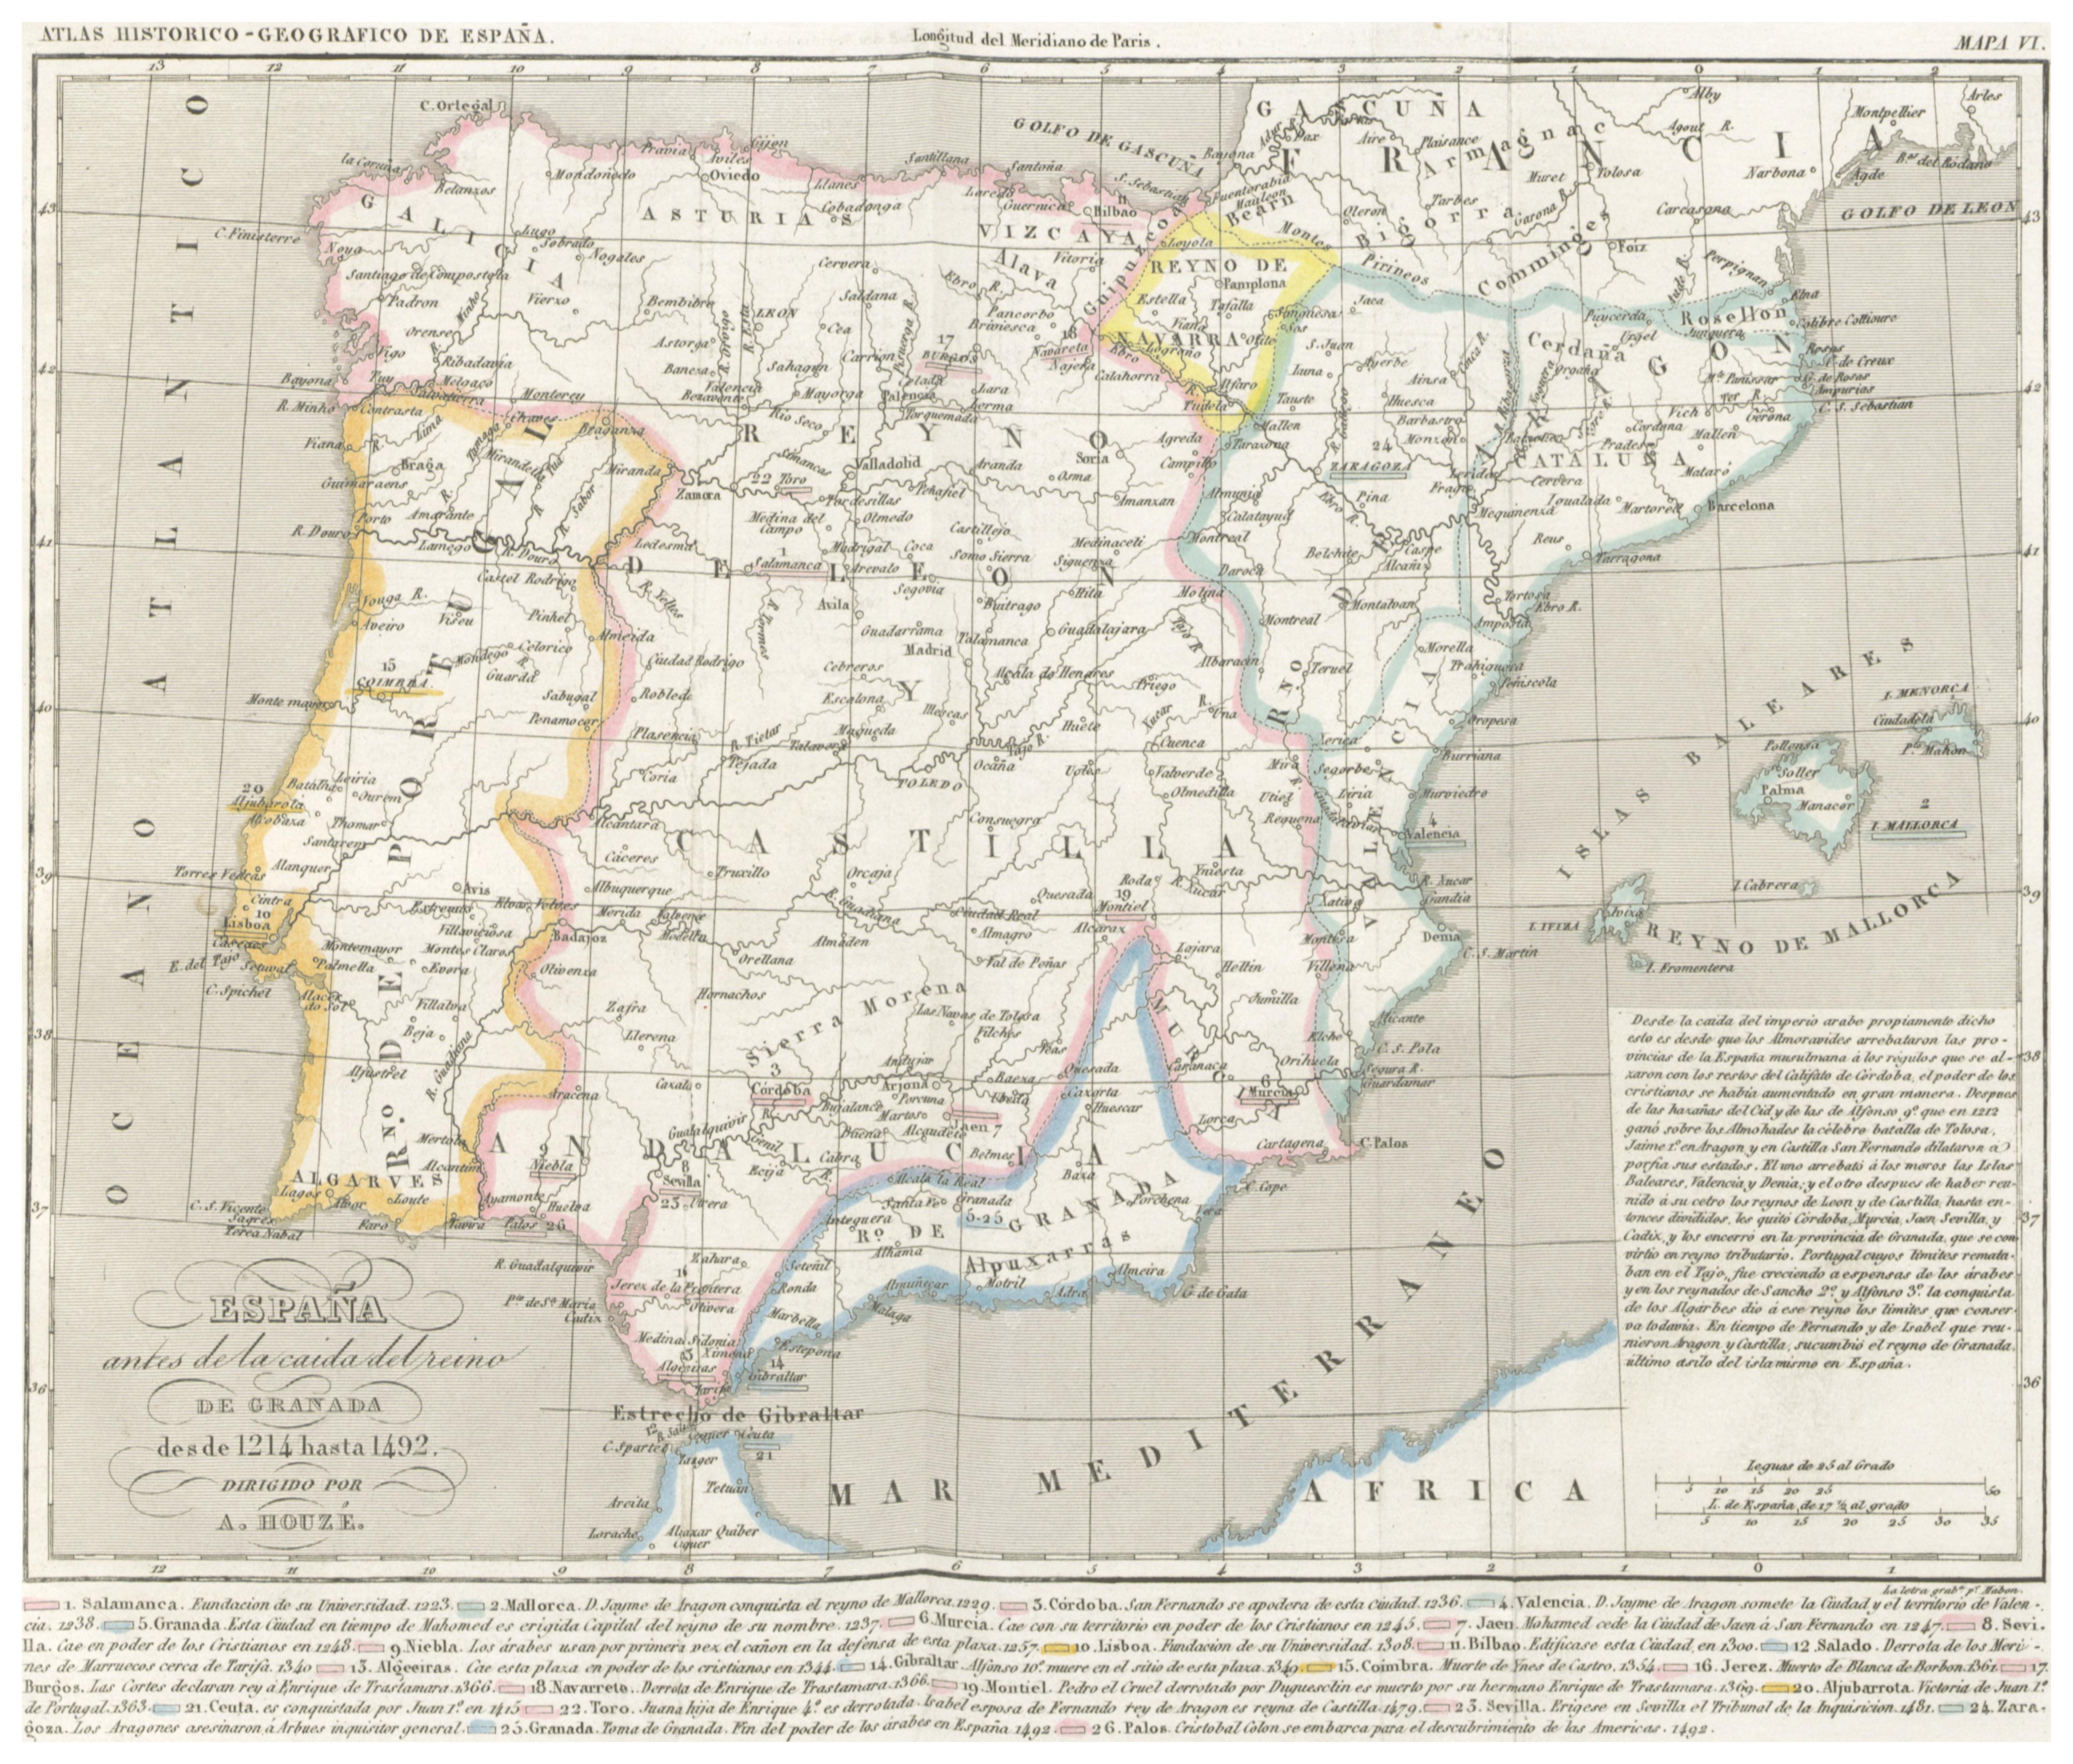 File:CHAO(1849) Atlas Historico Geografico de España - Mapa 6 (1214